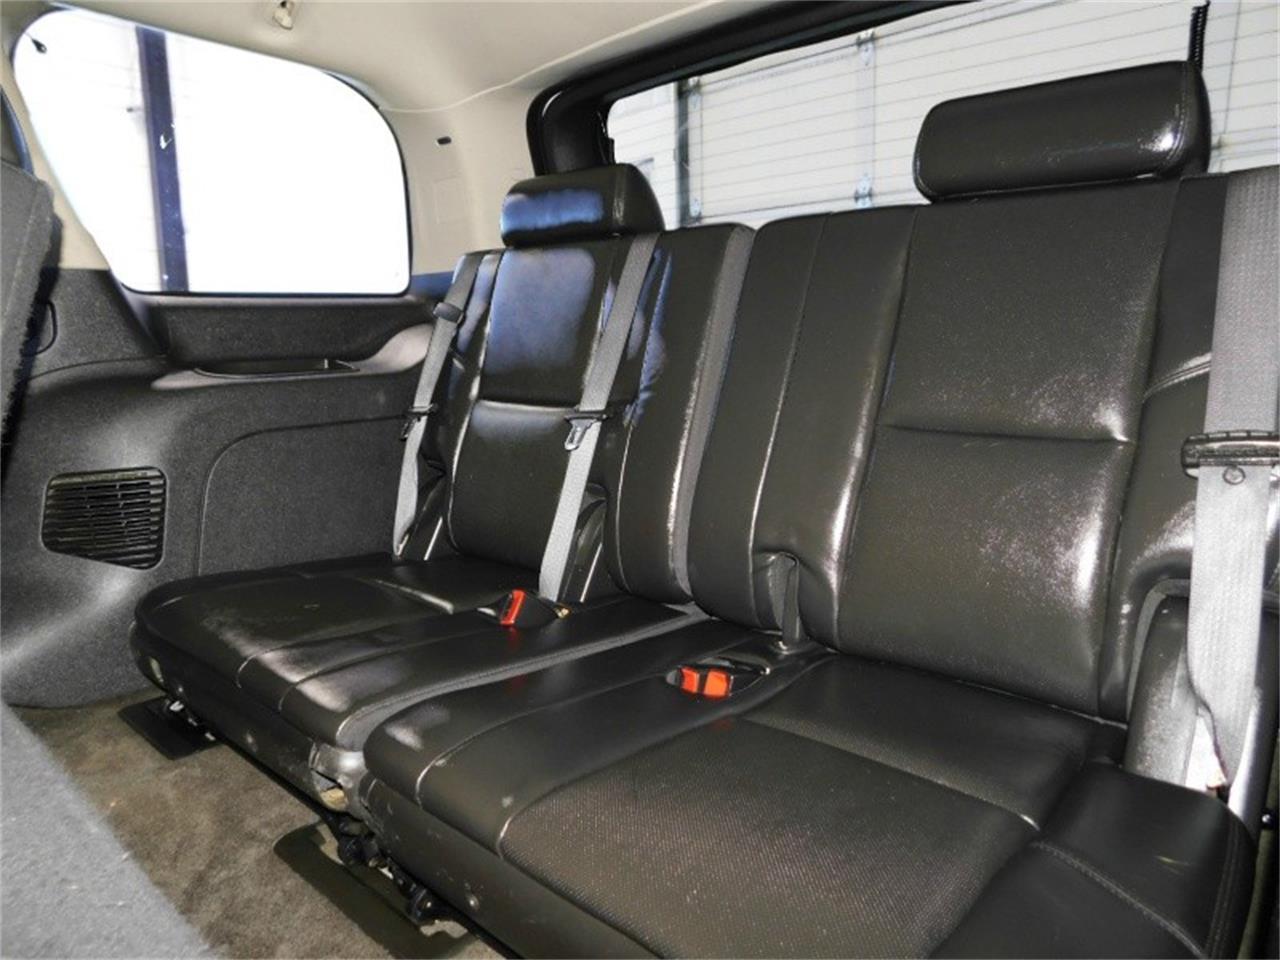 2009 Cadillac Escalade (CC-1229208) for sale in Bend, Oregon